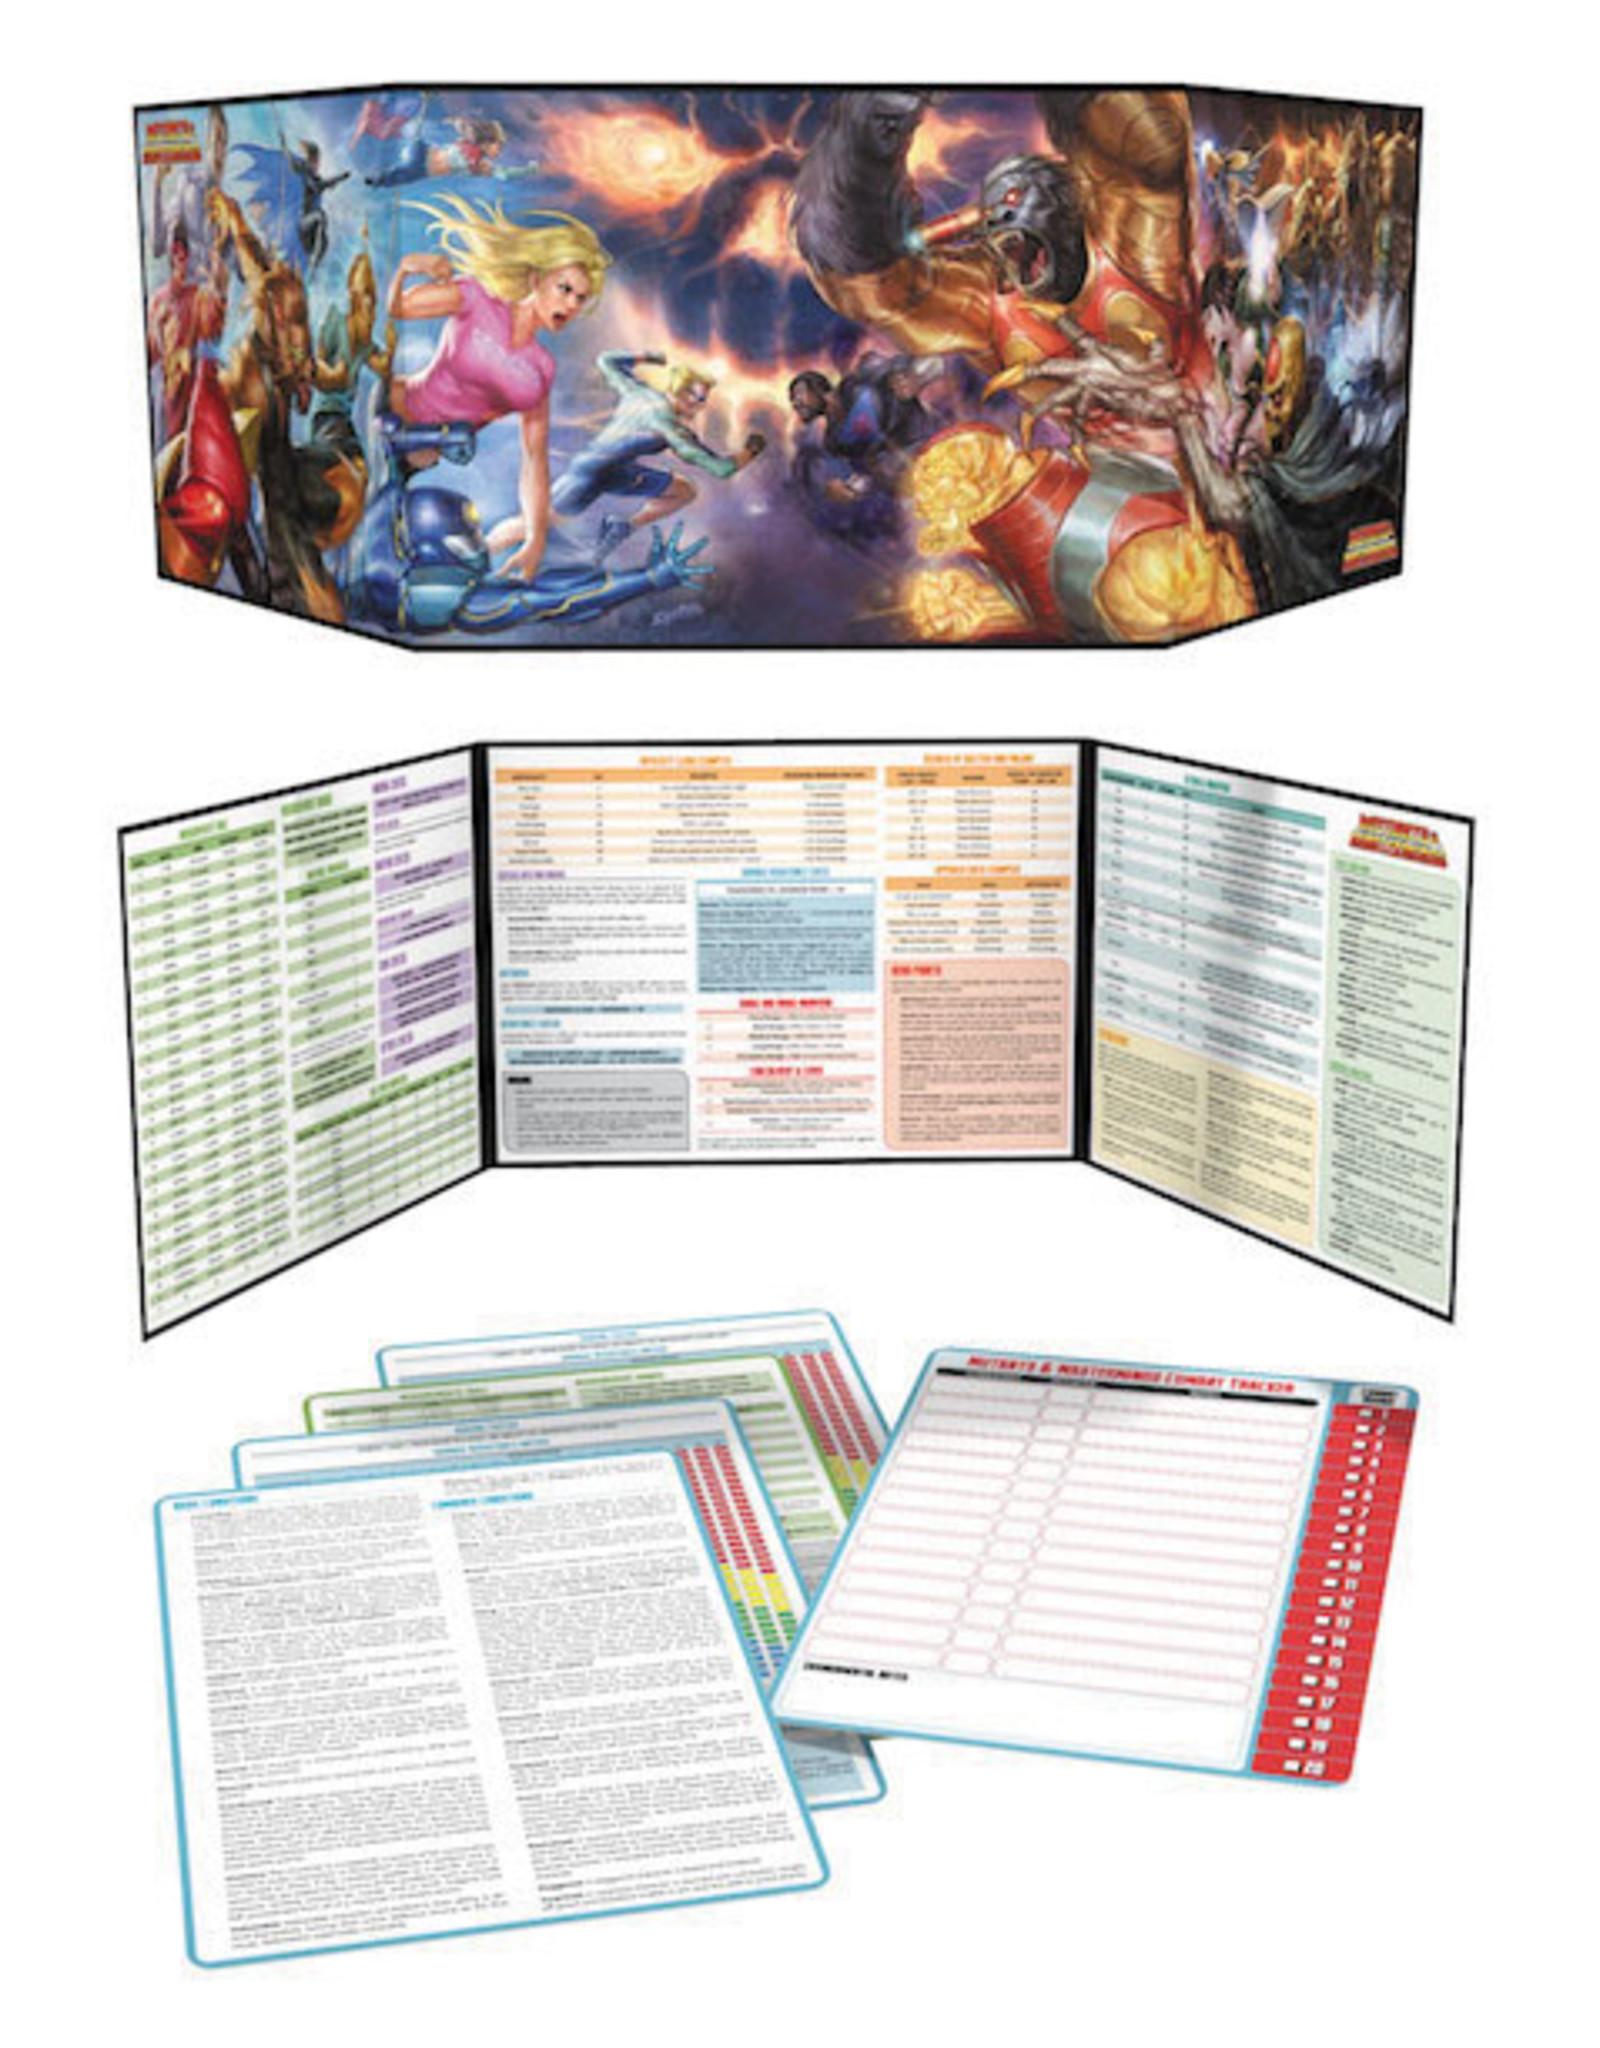 Mutants and Masterminds: Gamemaster Kits